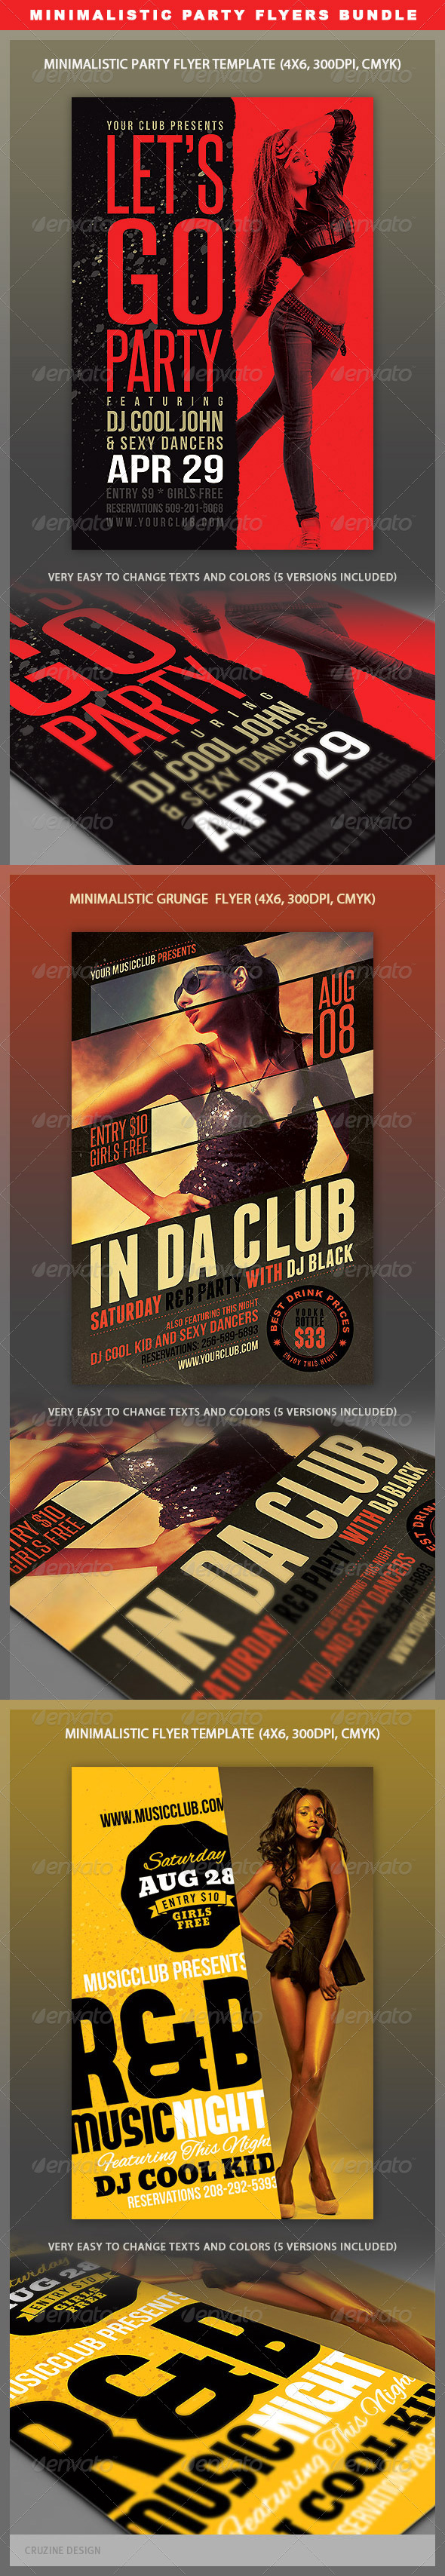 Minimalistic Party Flyers Bundle - Clubs & Parties Events